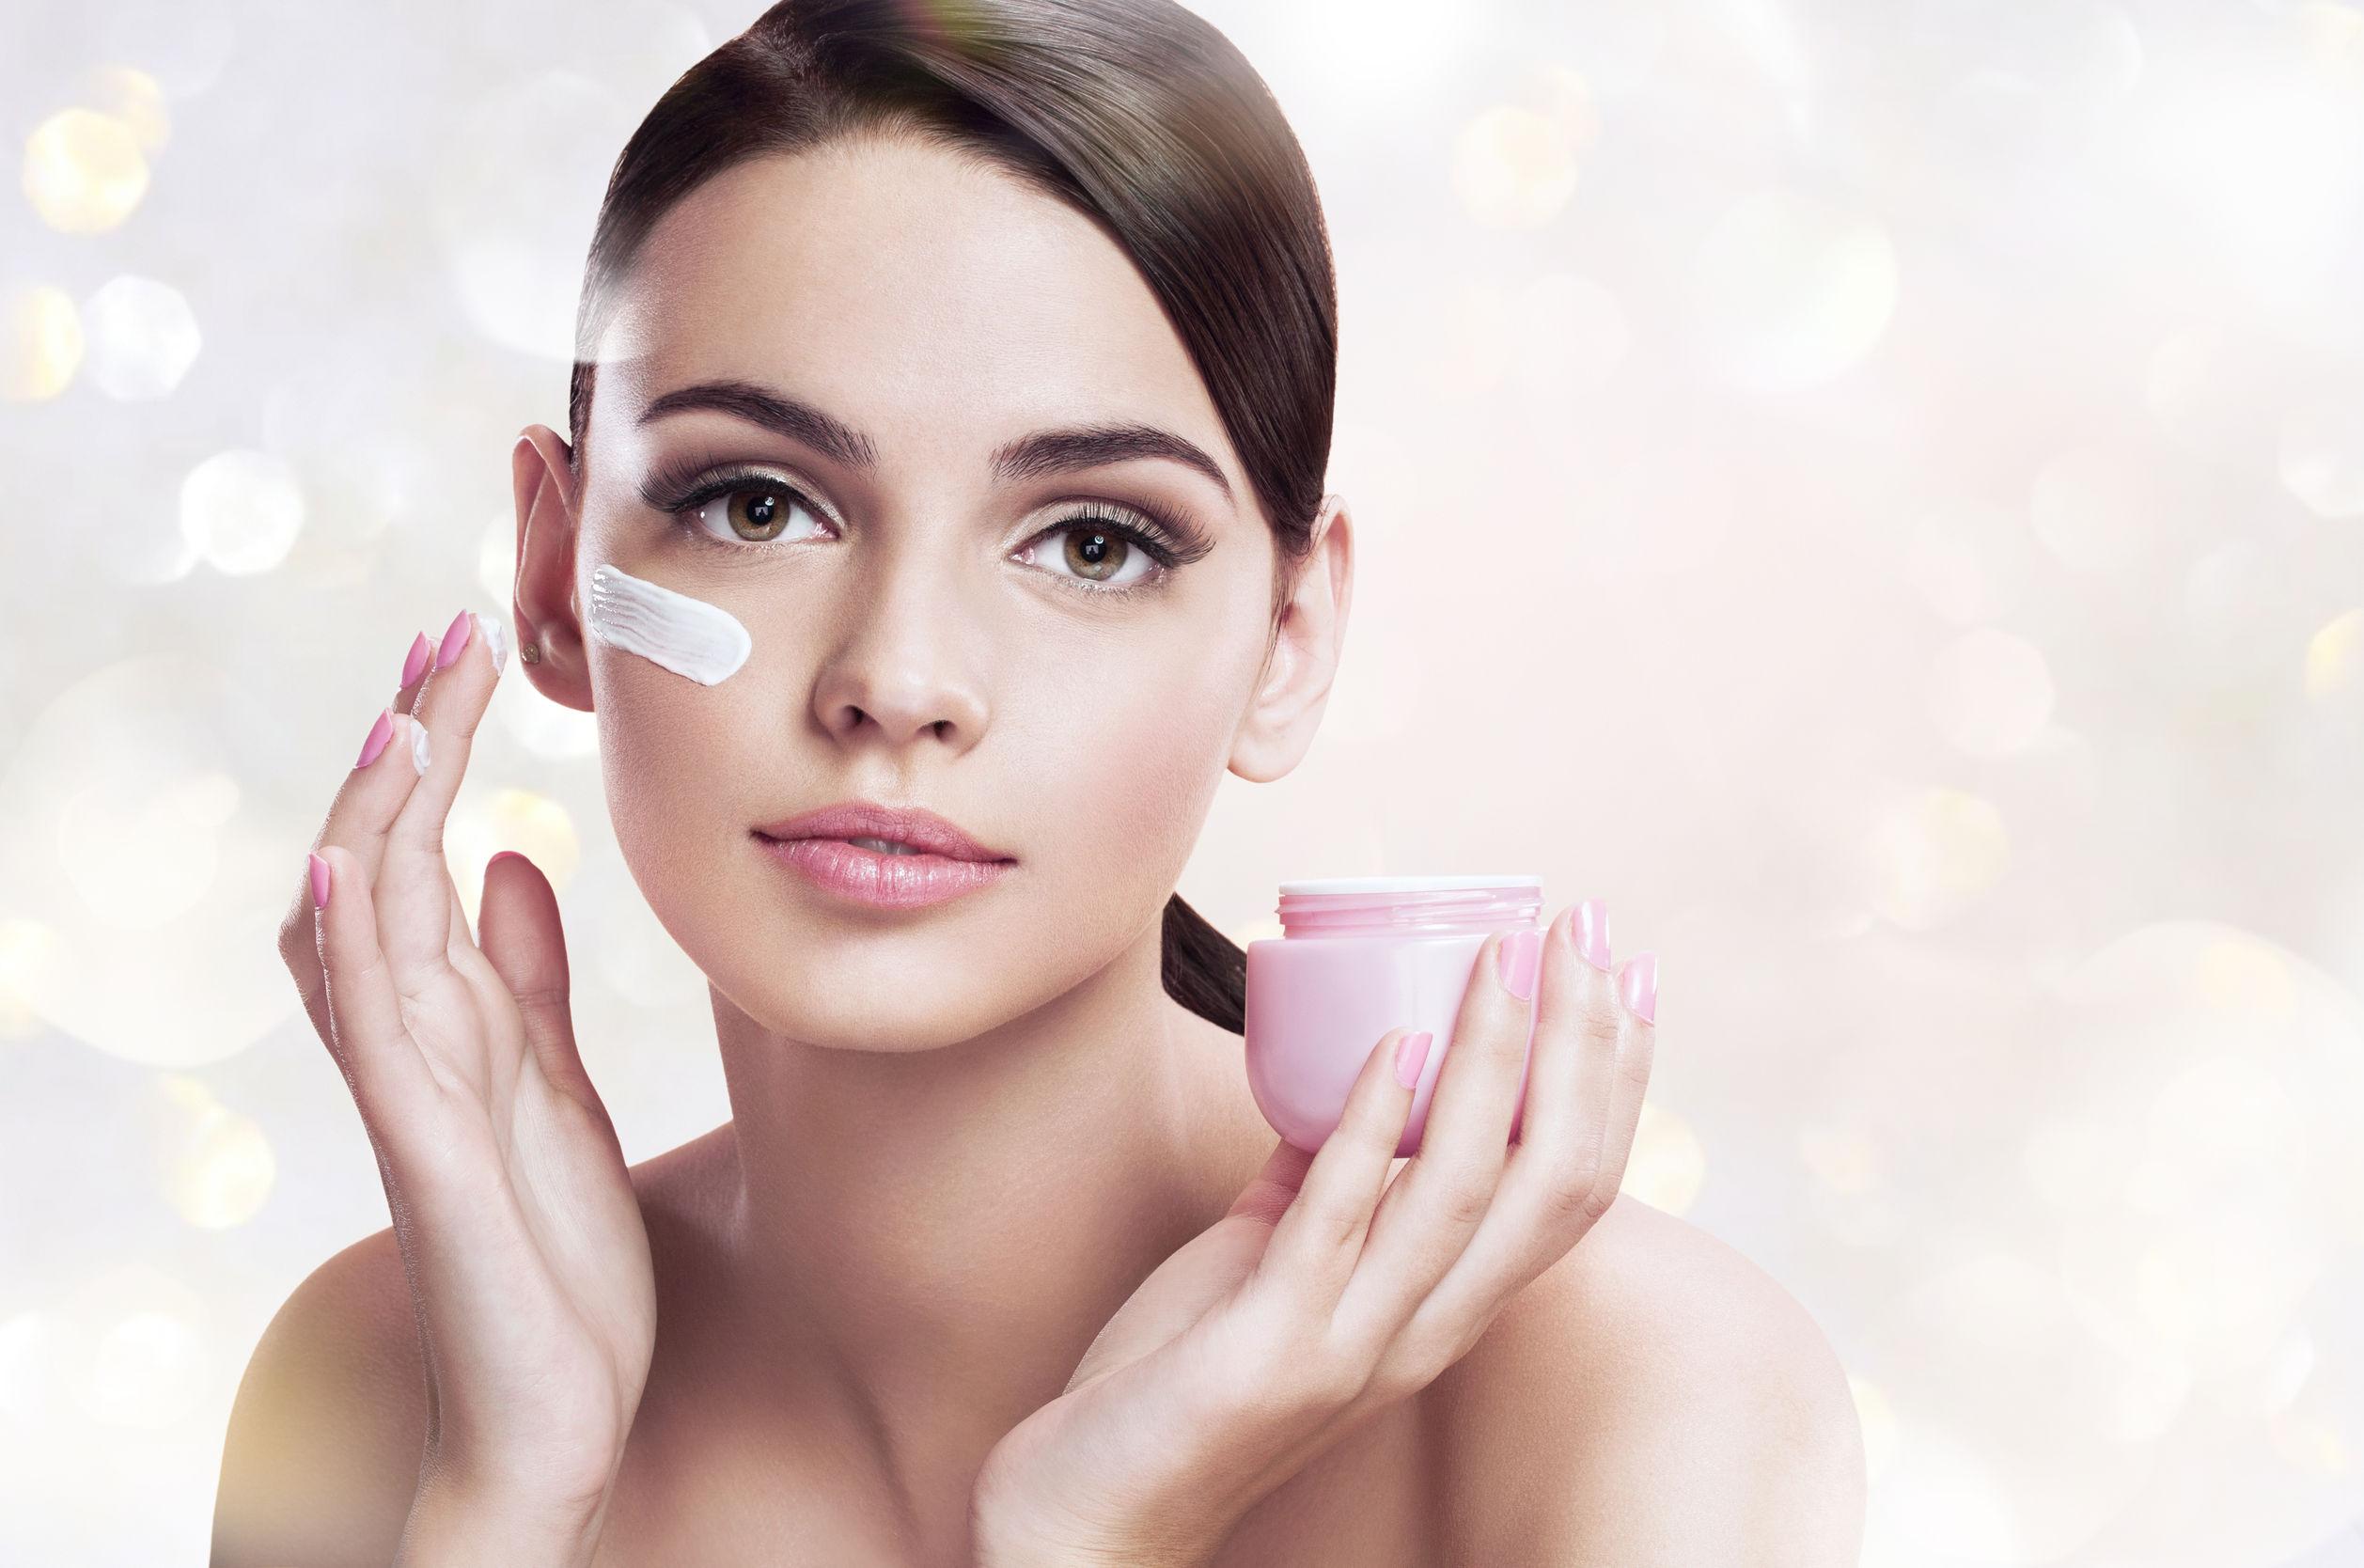 38022079 - beautiful young woman applying moisturizing creme, skin care concept